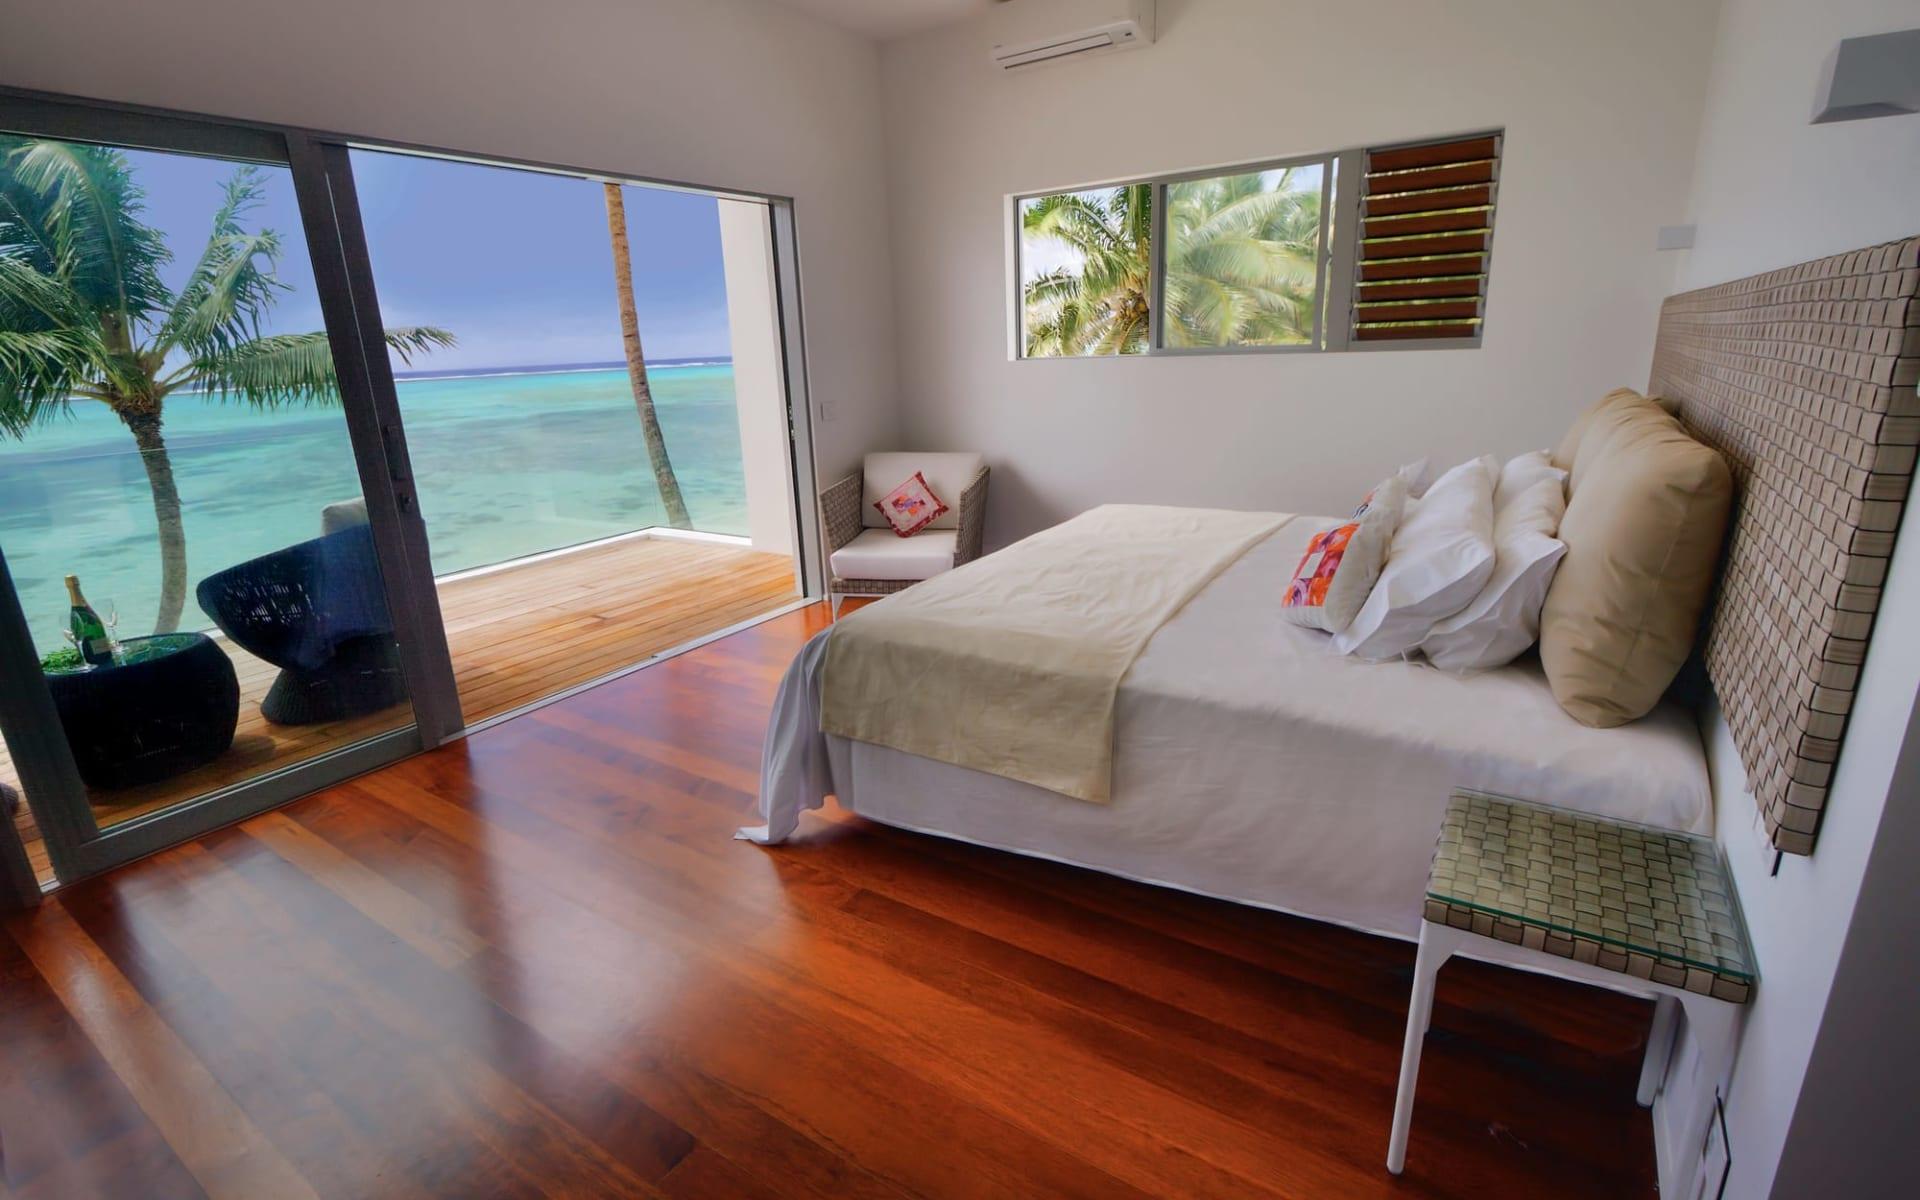 Crystal Blue Lagoon Villas in Rarotonga:  Crystal Blue Lagoon Villas - 2-Bedroom Beachfront Bungalow